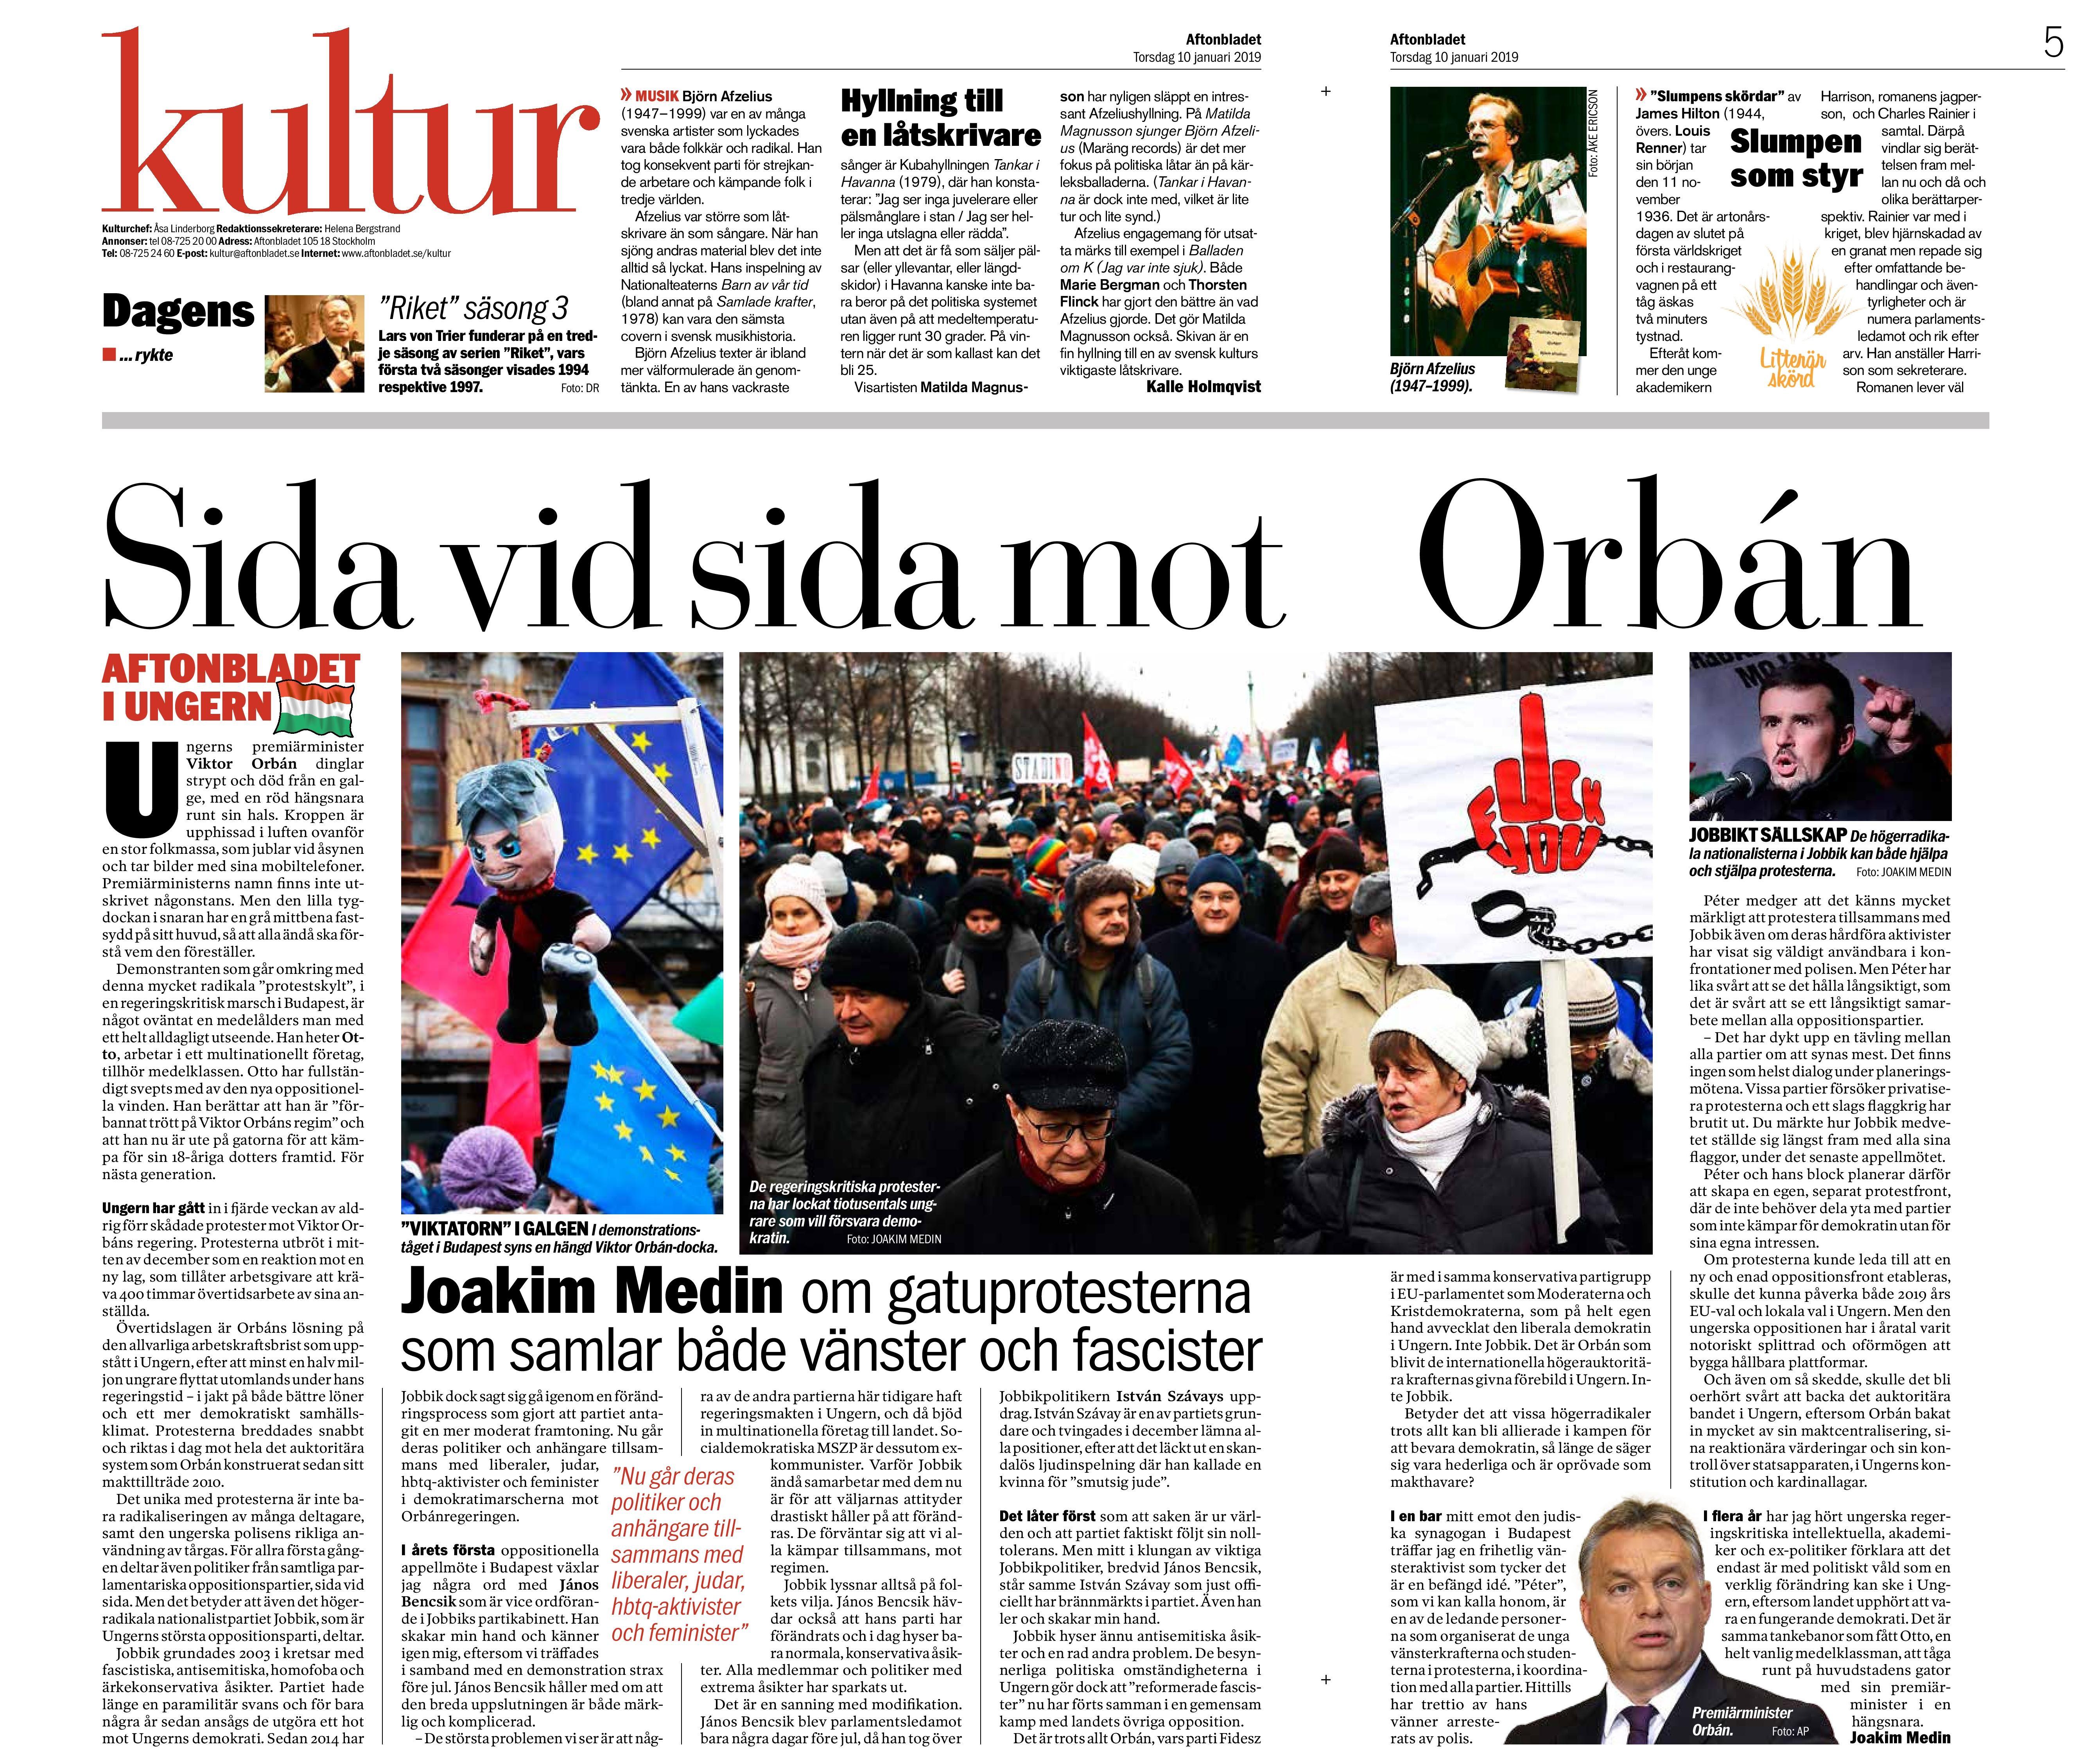 Ungern, Aftonbladet 2019-01-10